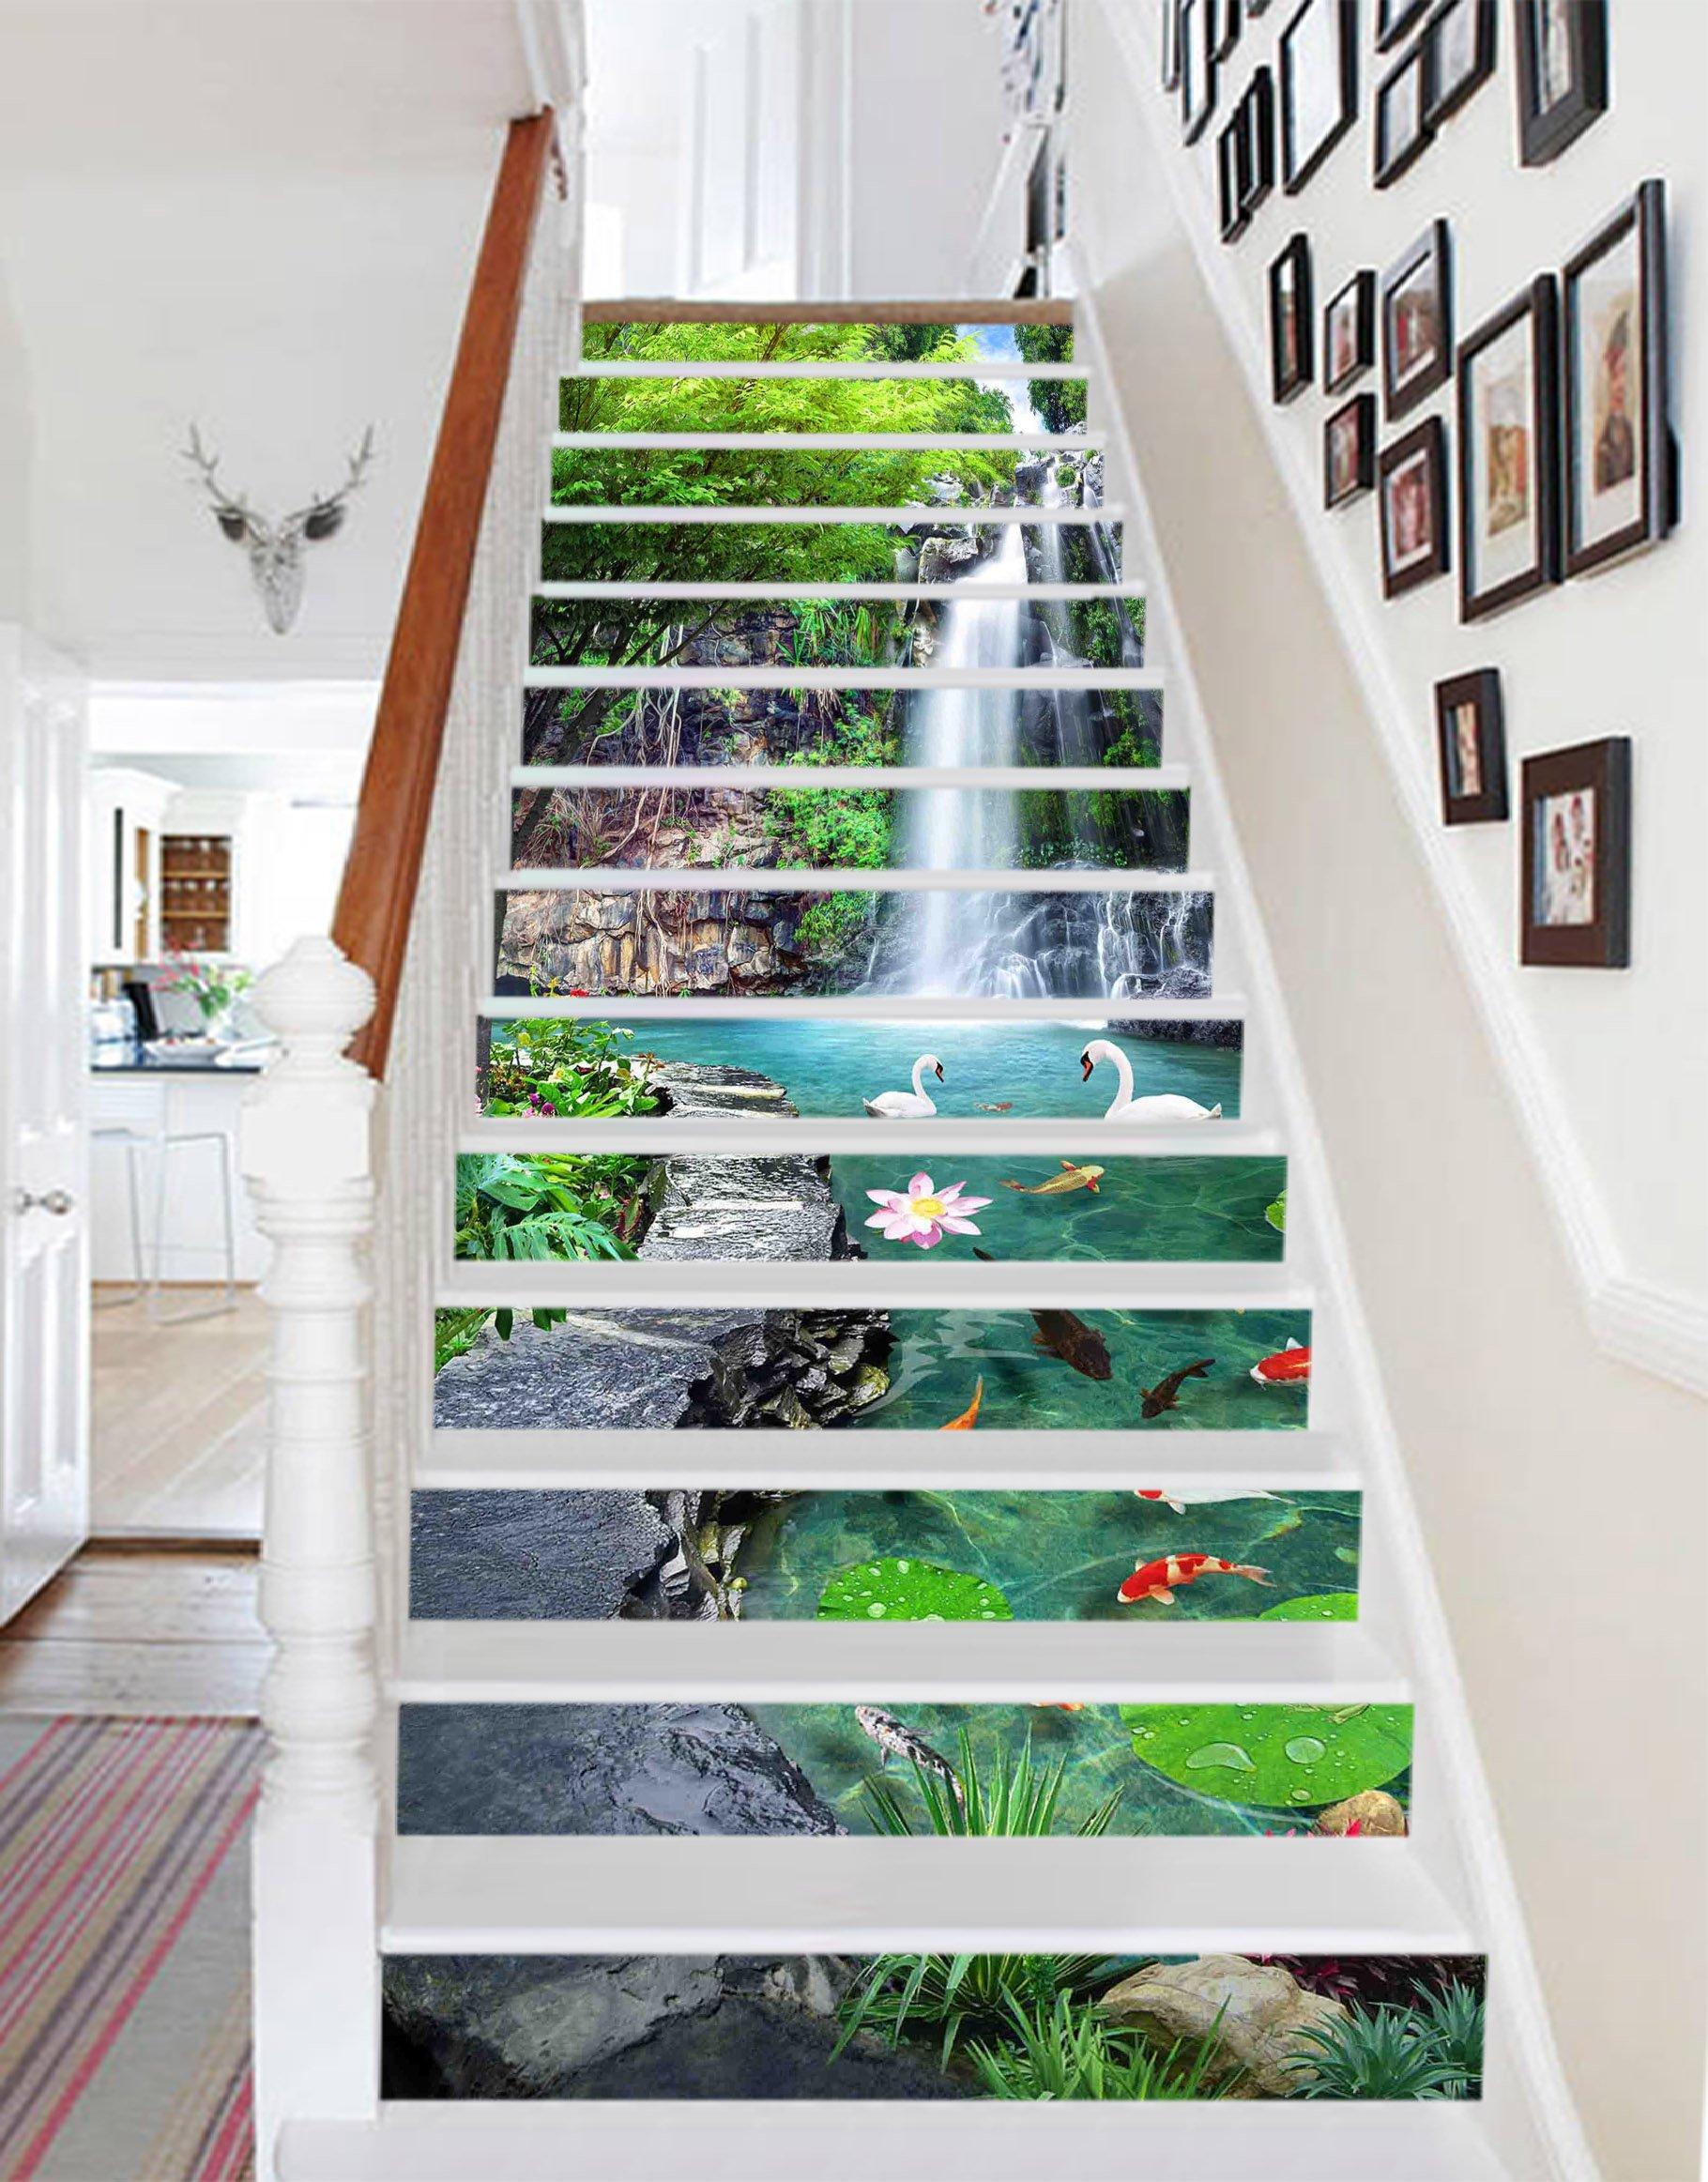 3D Waterfall Tree Nature 531 Stair Risers Decoration Photo Mural Vinyl Decal Wallpaper Murals Wallpaper Mural US Lemon (13x H:18cm x W:94cm (7''x37''))